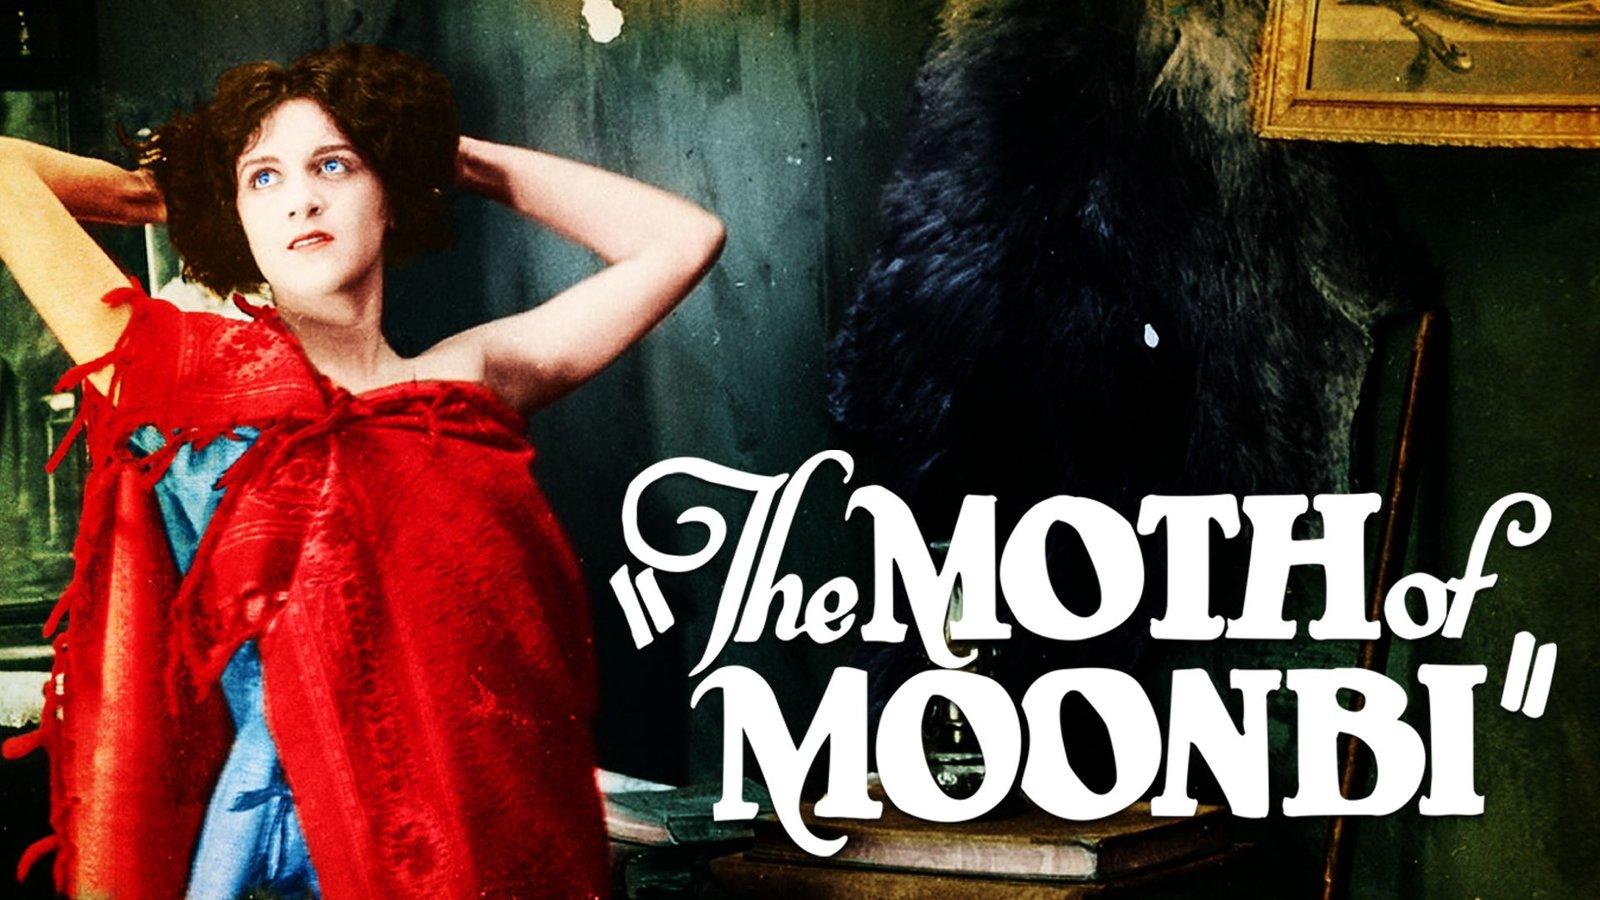 The Moth of Moonbi